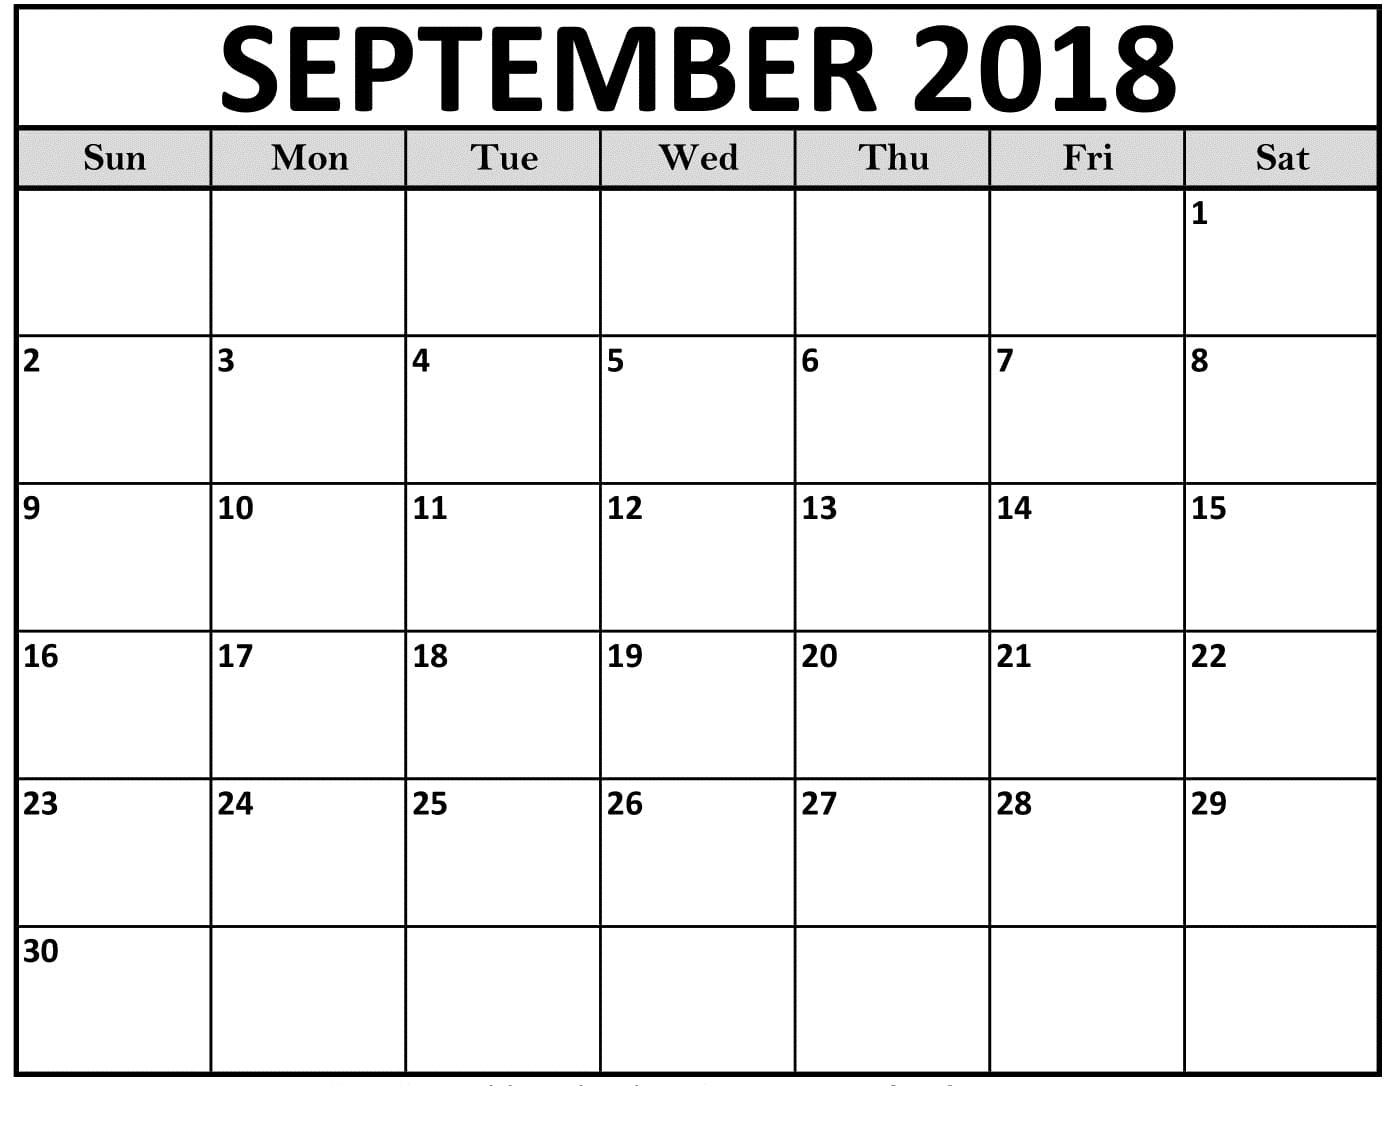 Printable Calendar Template September 2018 | Printable Calendar 2019 intended for September Calendar Printable Template